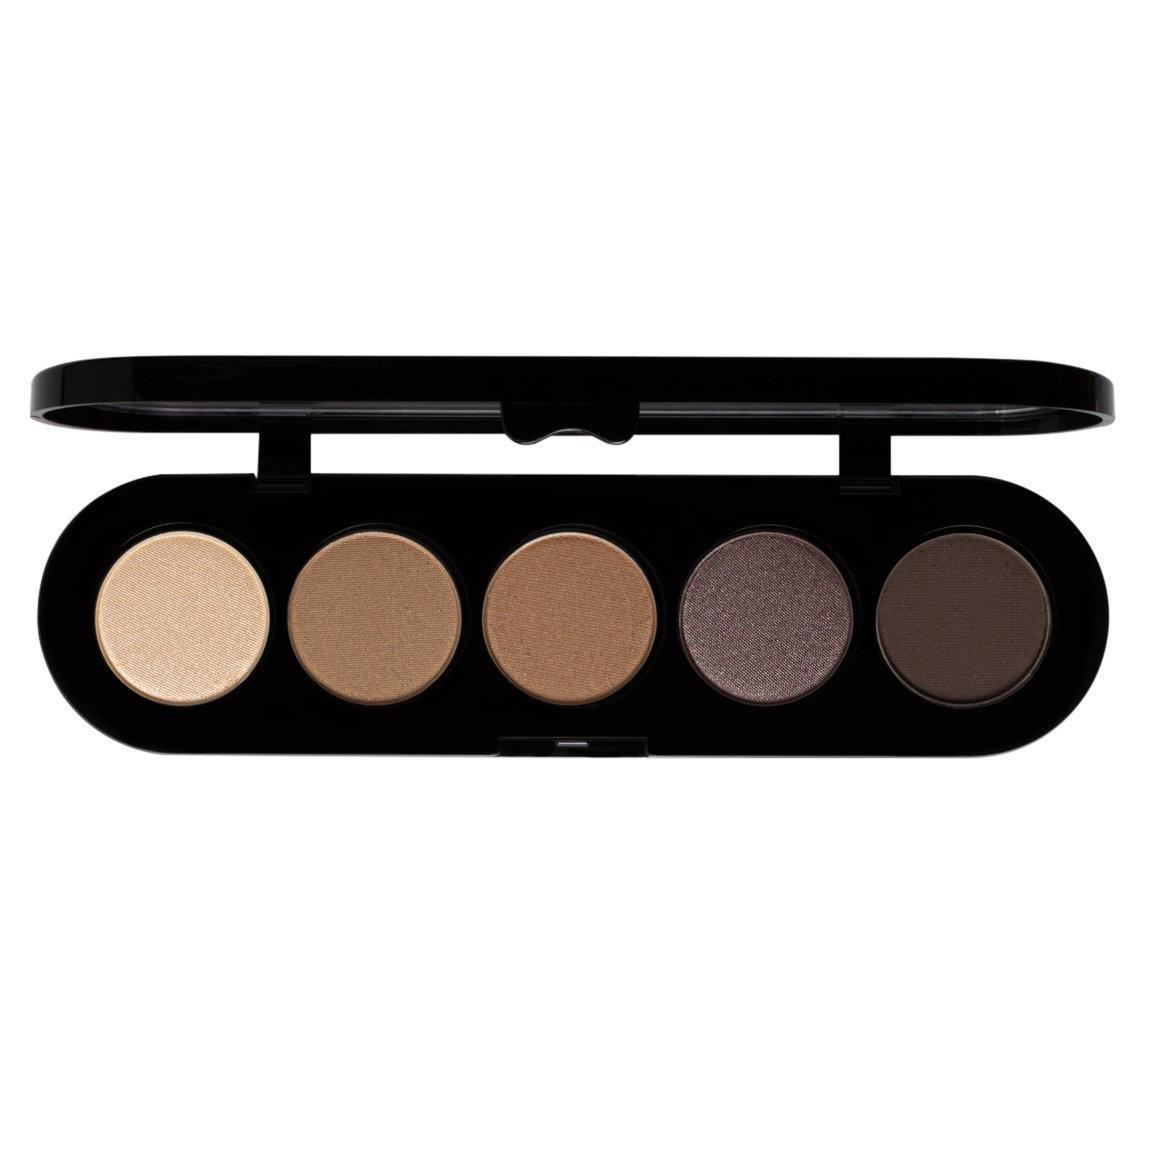 Makeup Atelier Paris 5 Eyeshadows Palette Smokey Brown T26